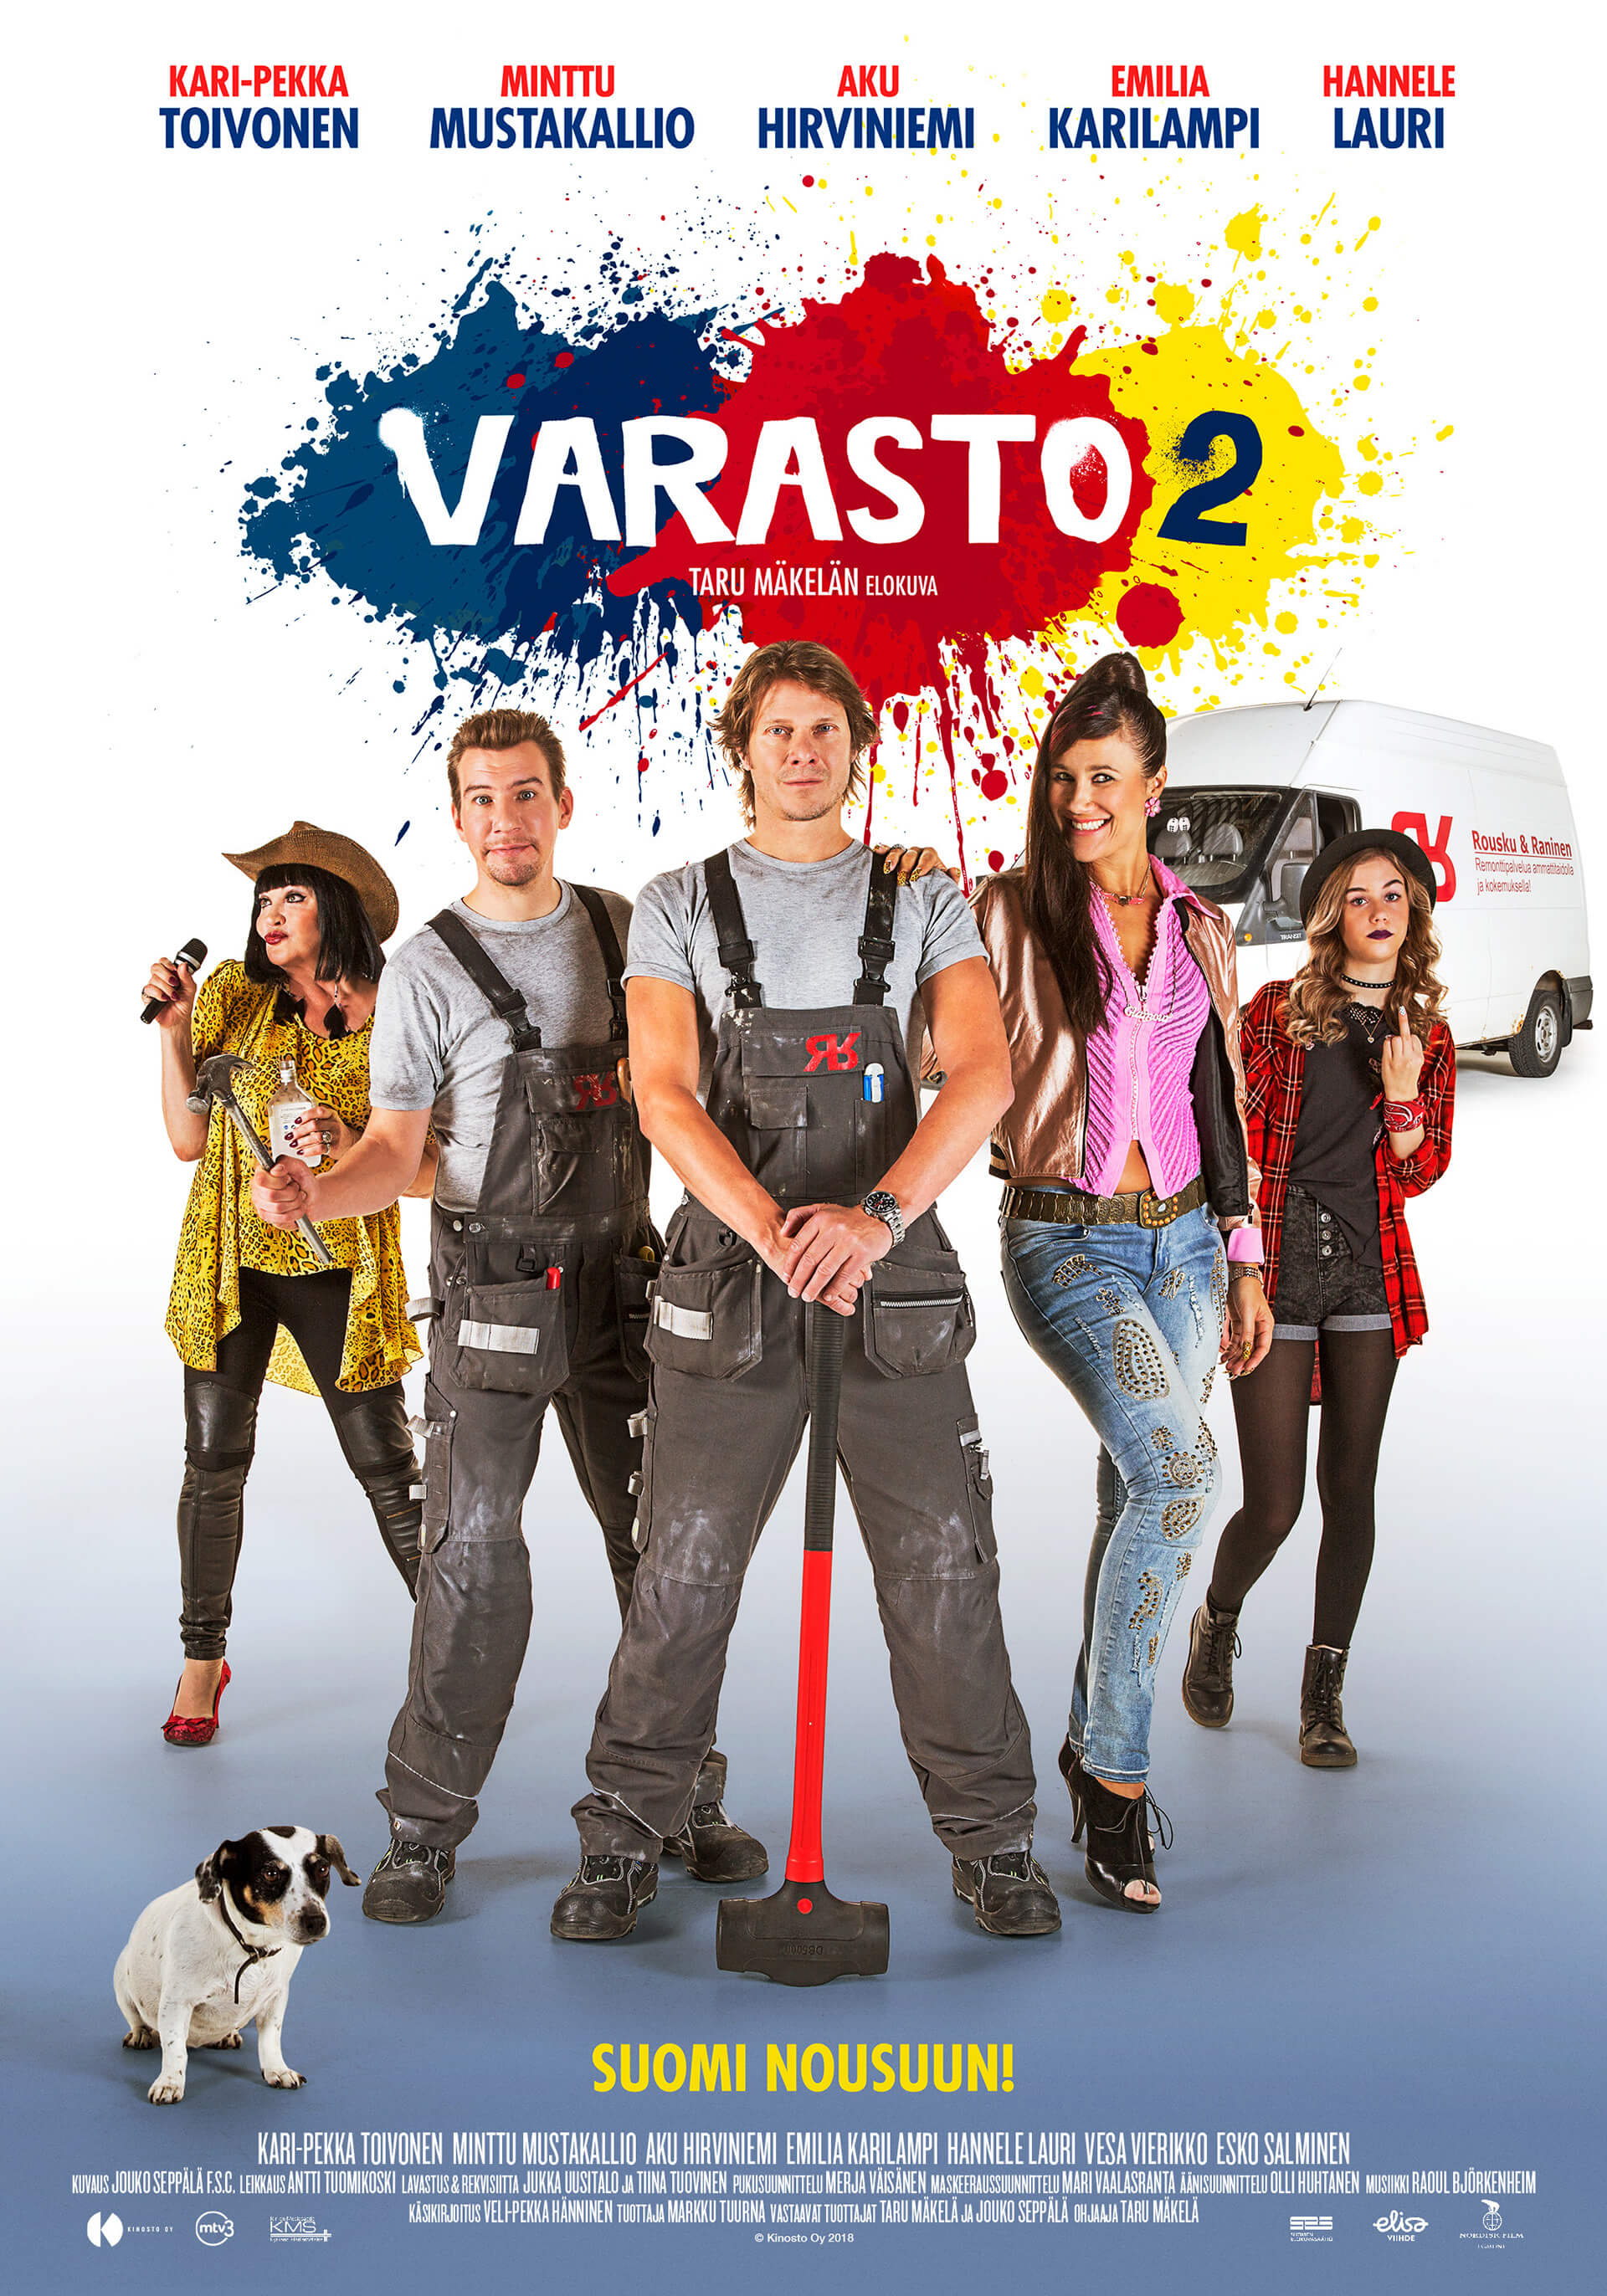 https://nordiskfilm.fi/wp-content/uploads/2017/11/posterFI70x100-Varasto2.jpg